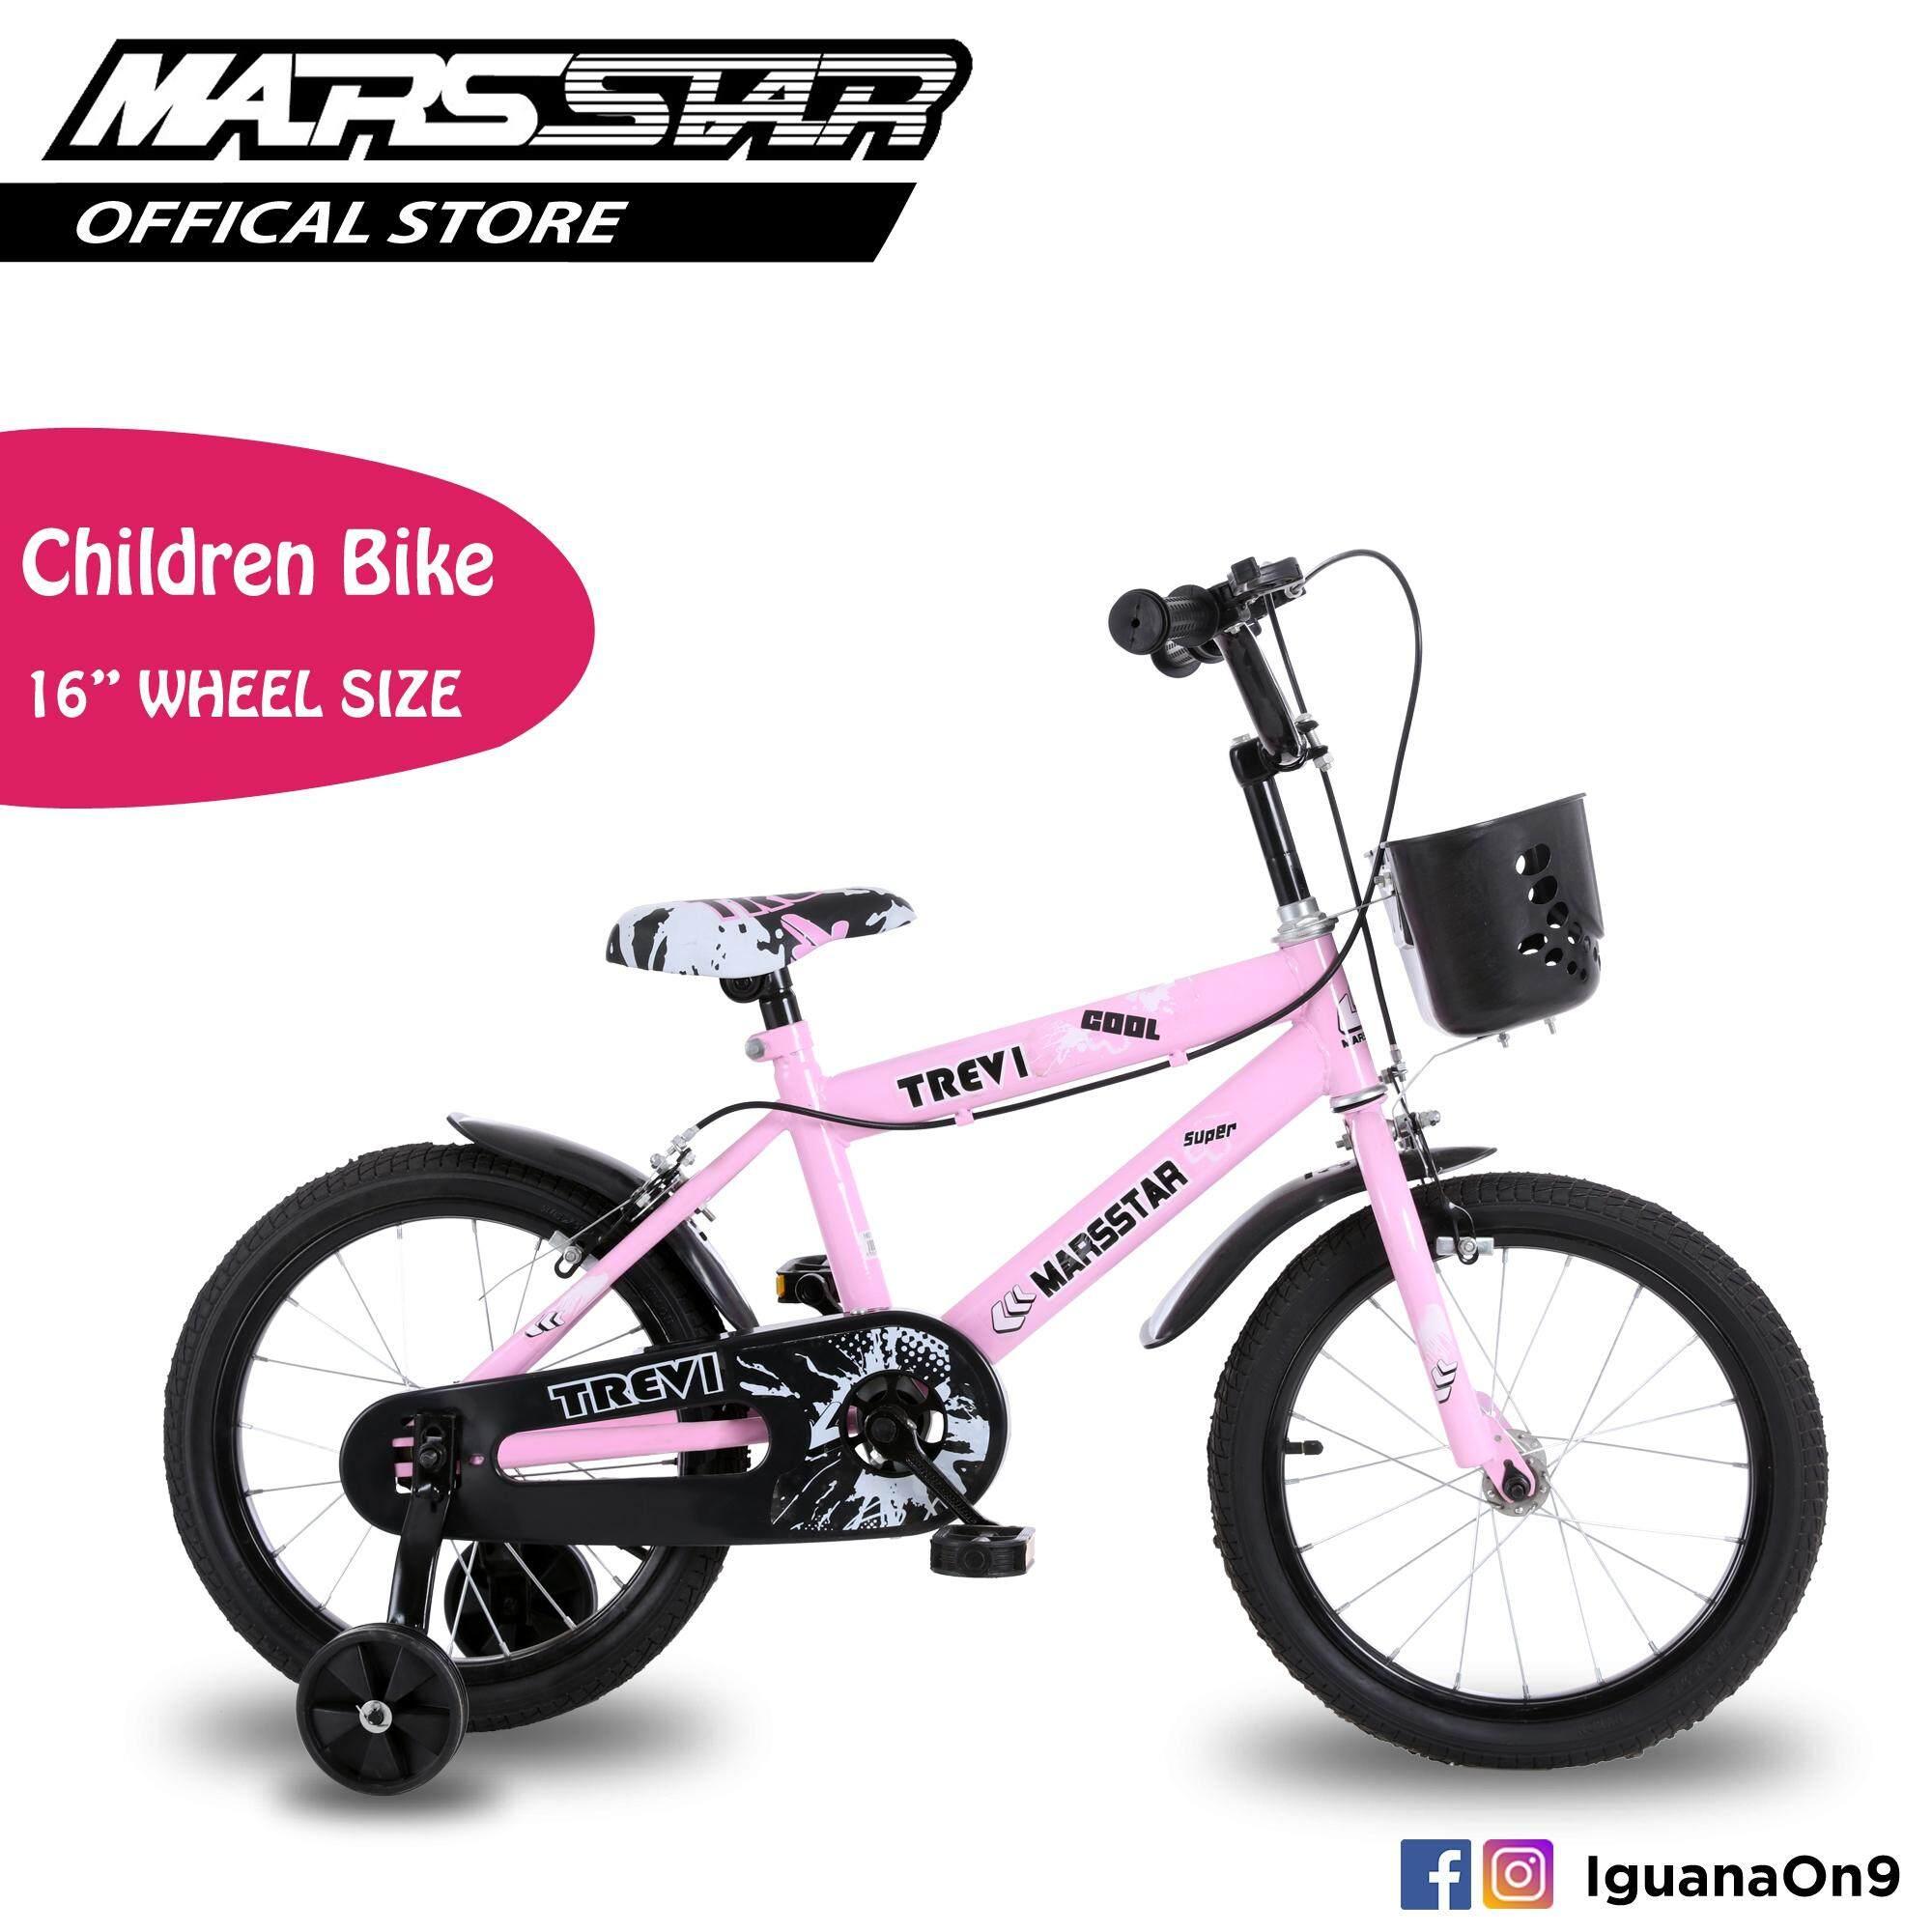 MARSSTAR 1601 Trevi 16 inch Children Bicycle with Caliper Brake (Pink)